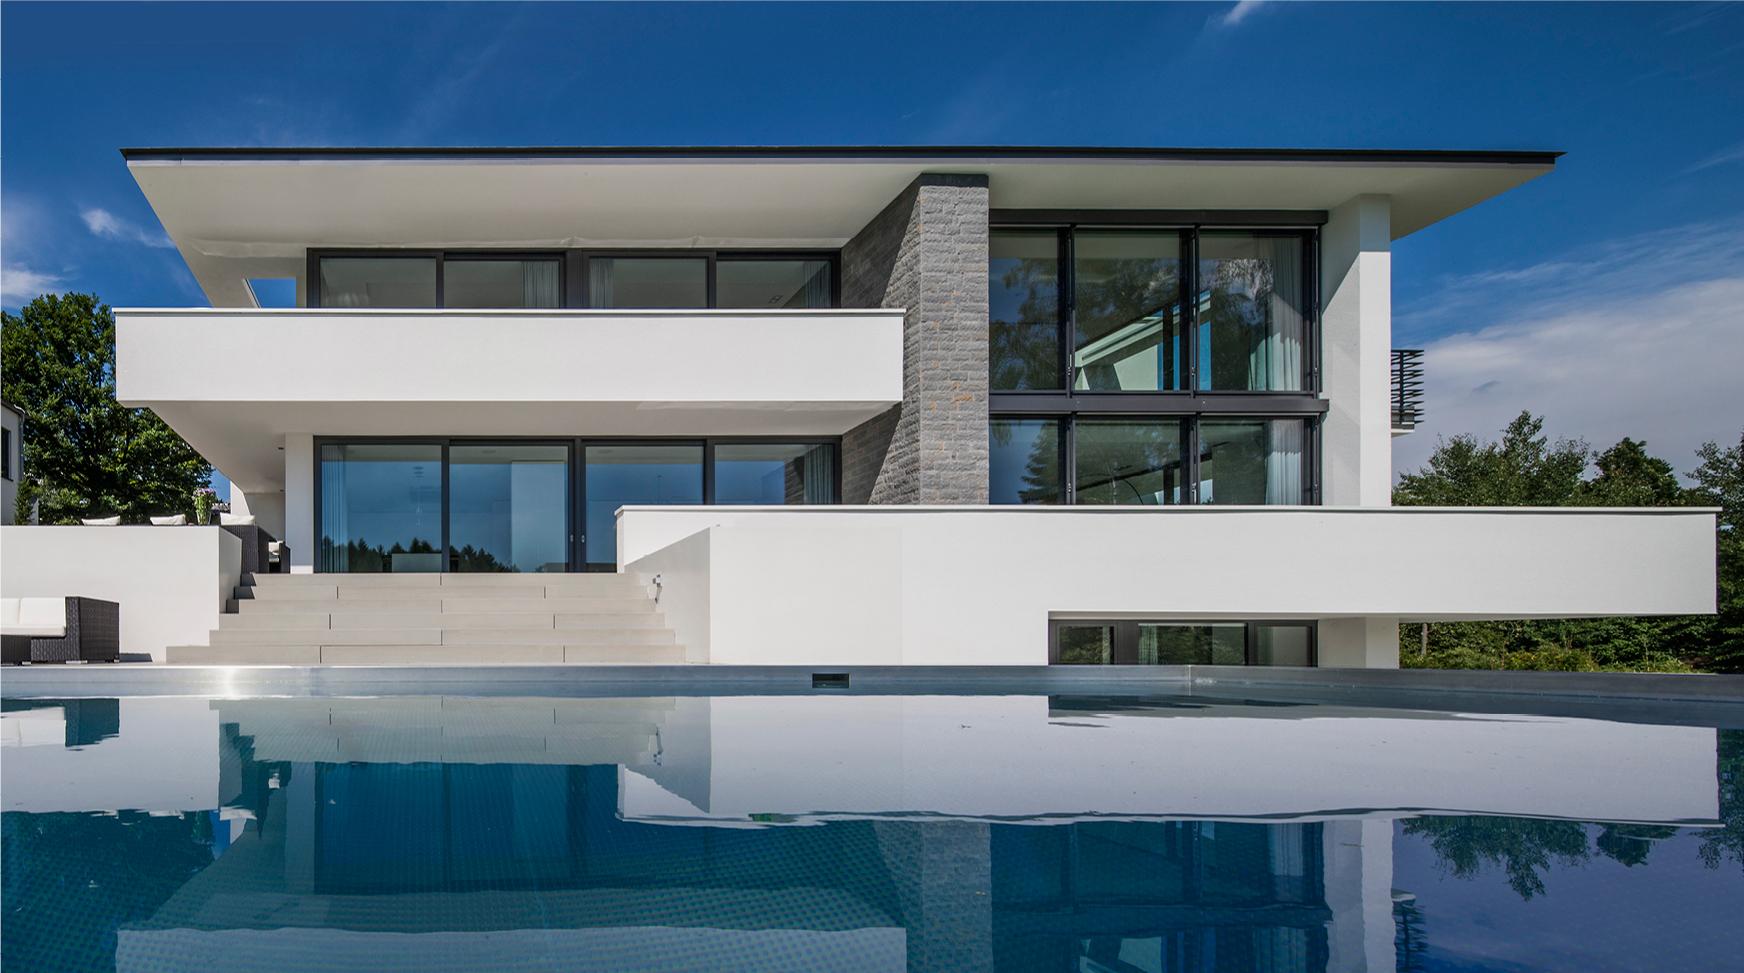 Johannes Vogt House JMC By Fuchs Wacker Architects 01